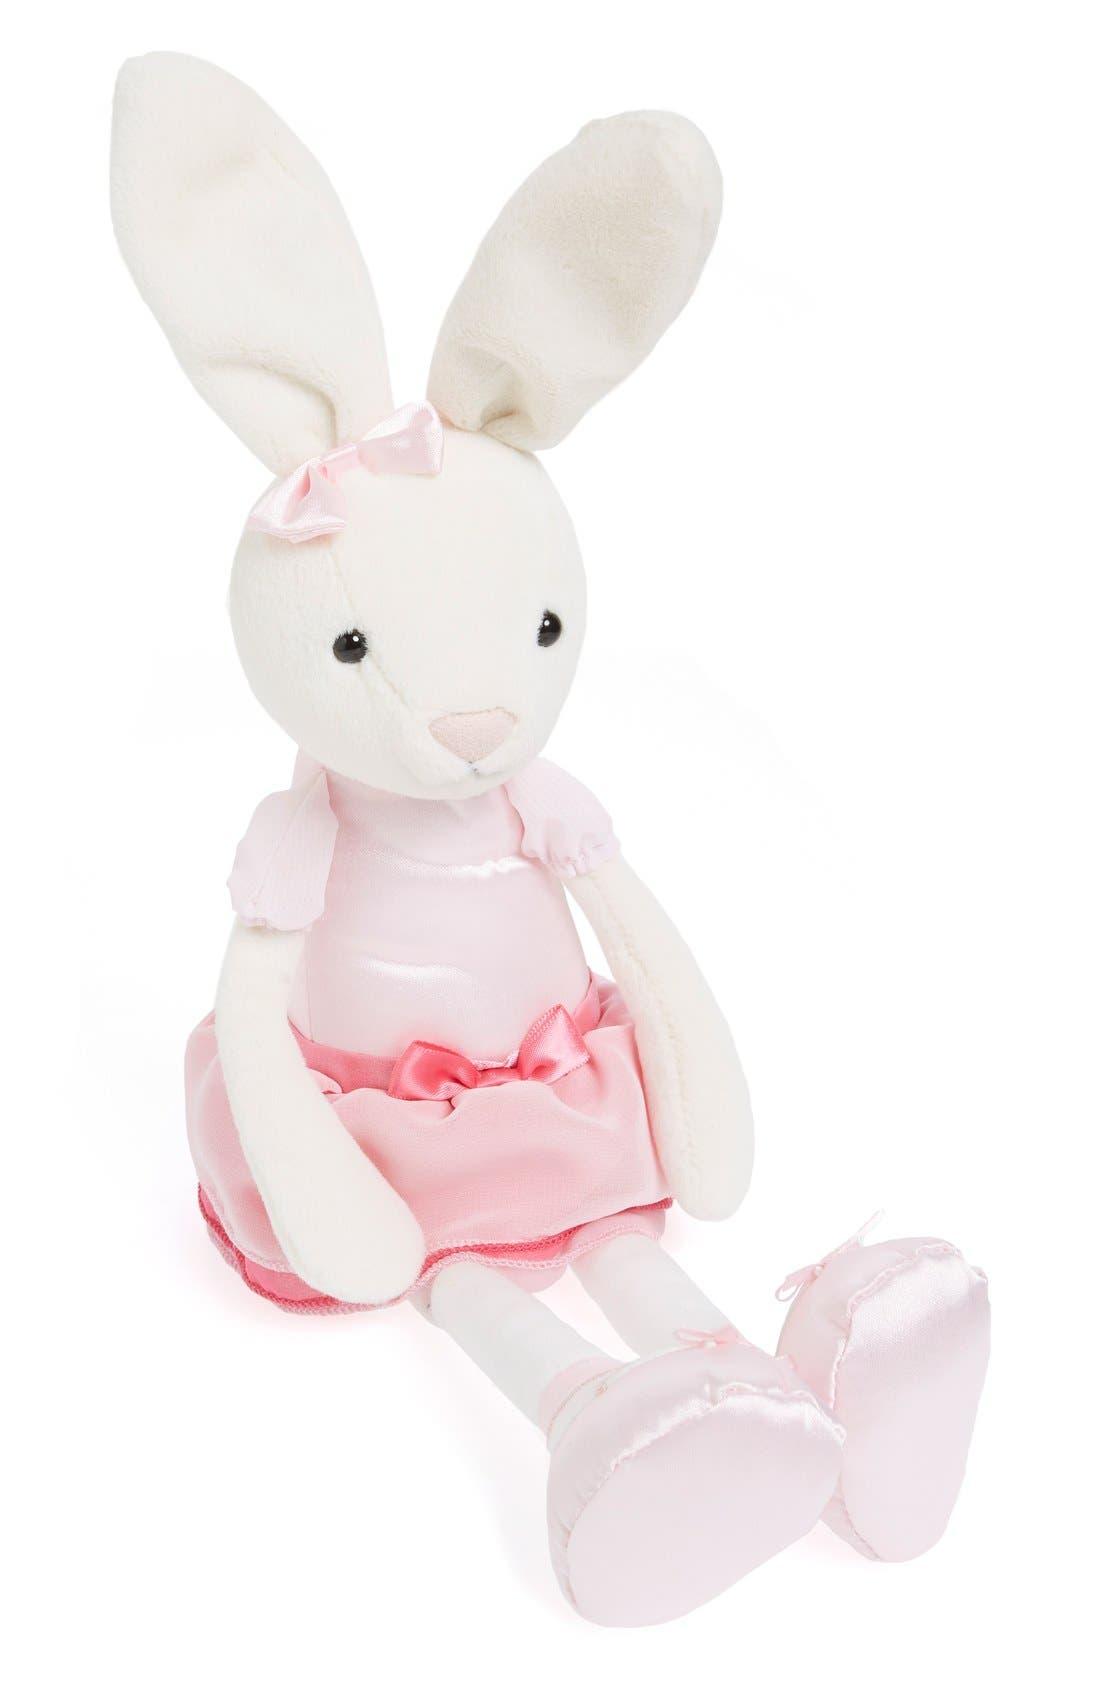 'Bitsy Ballerina Bunny' Stuffed Animal,                             Main thumbnail 1, color,                             Pink/ Cream